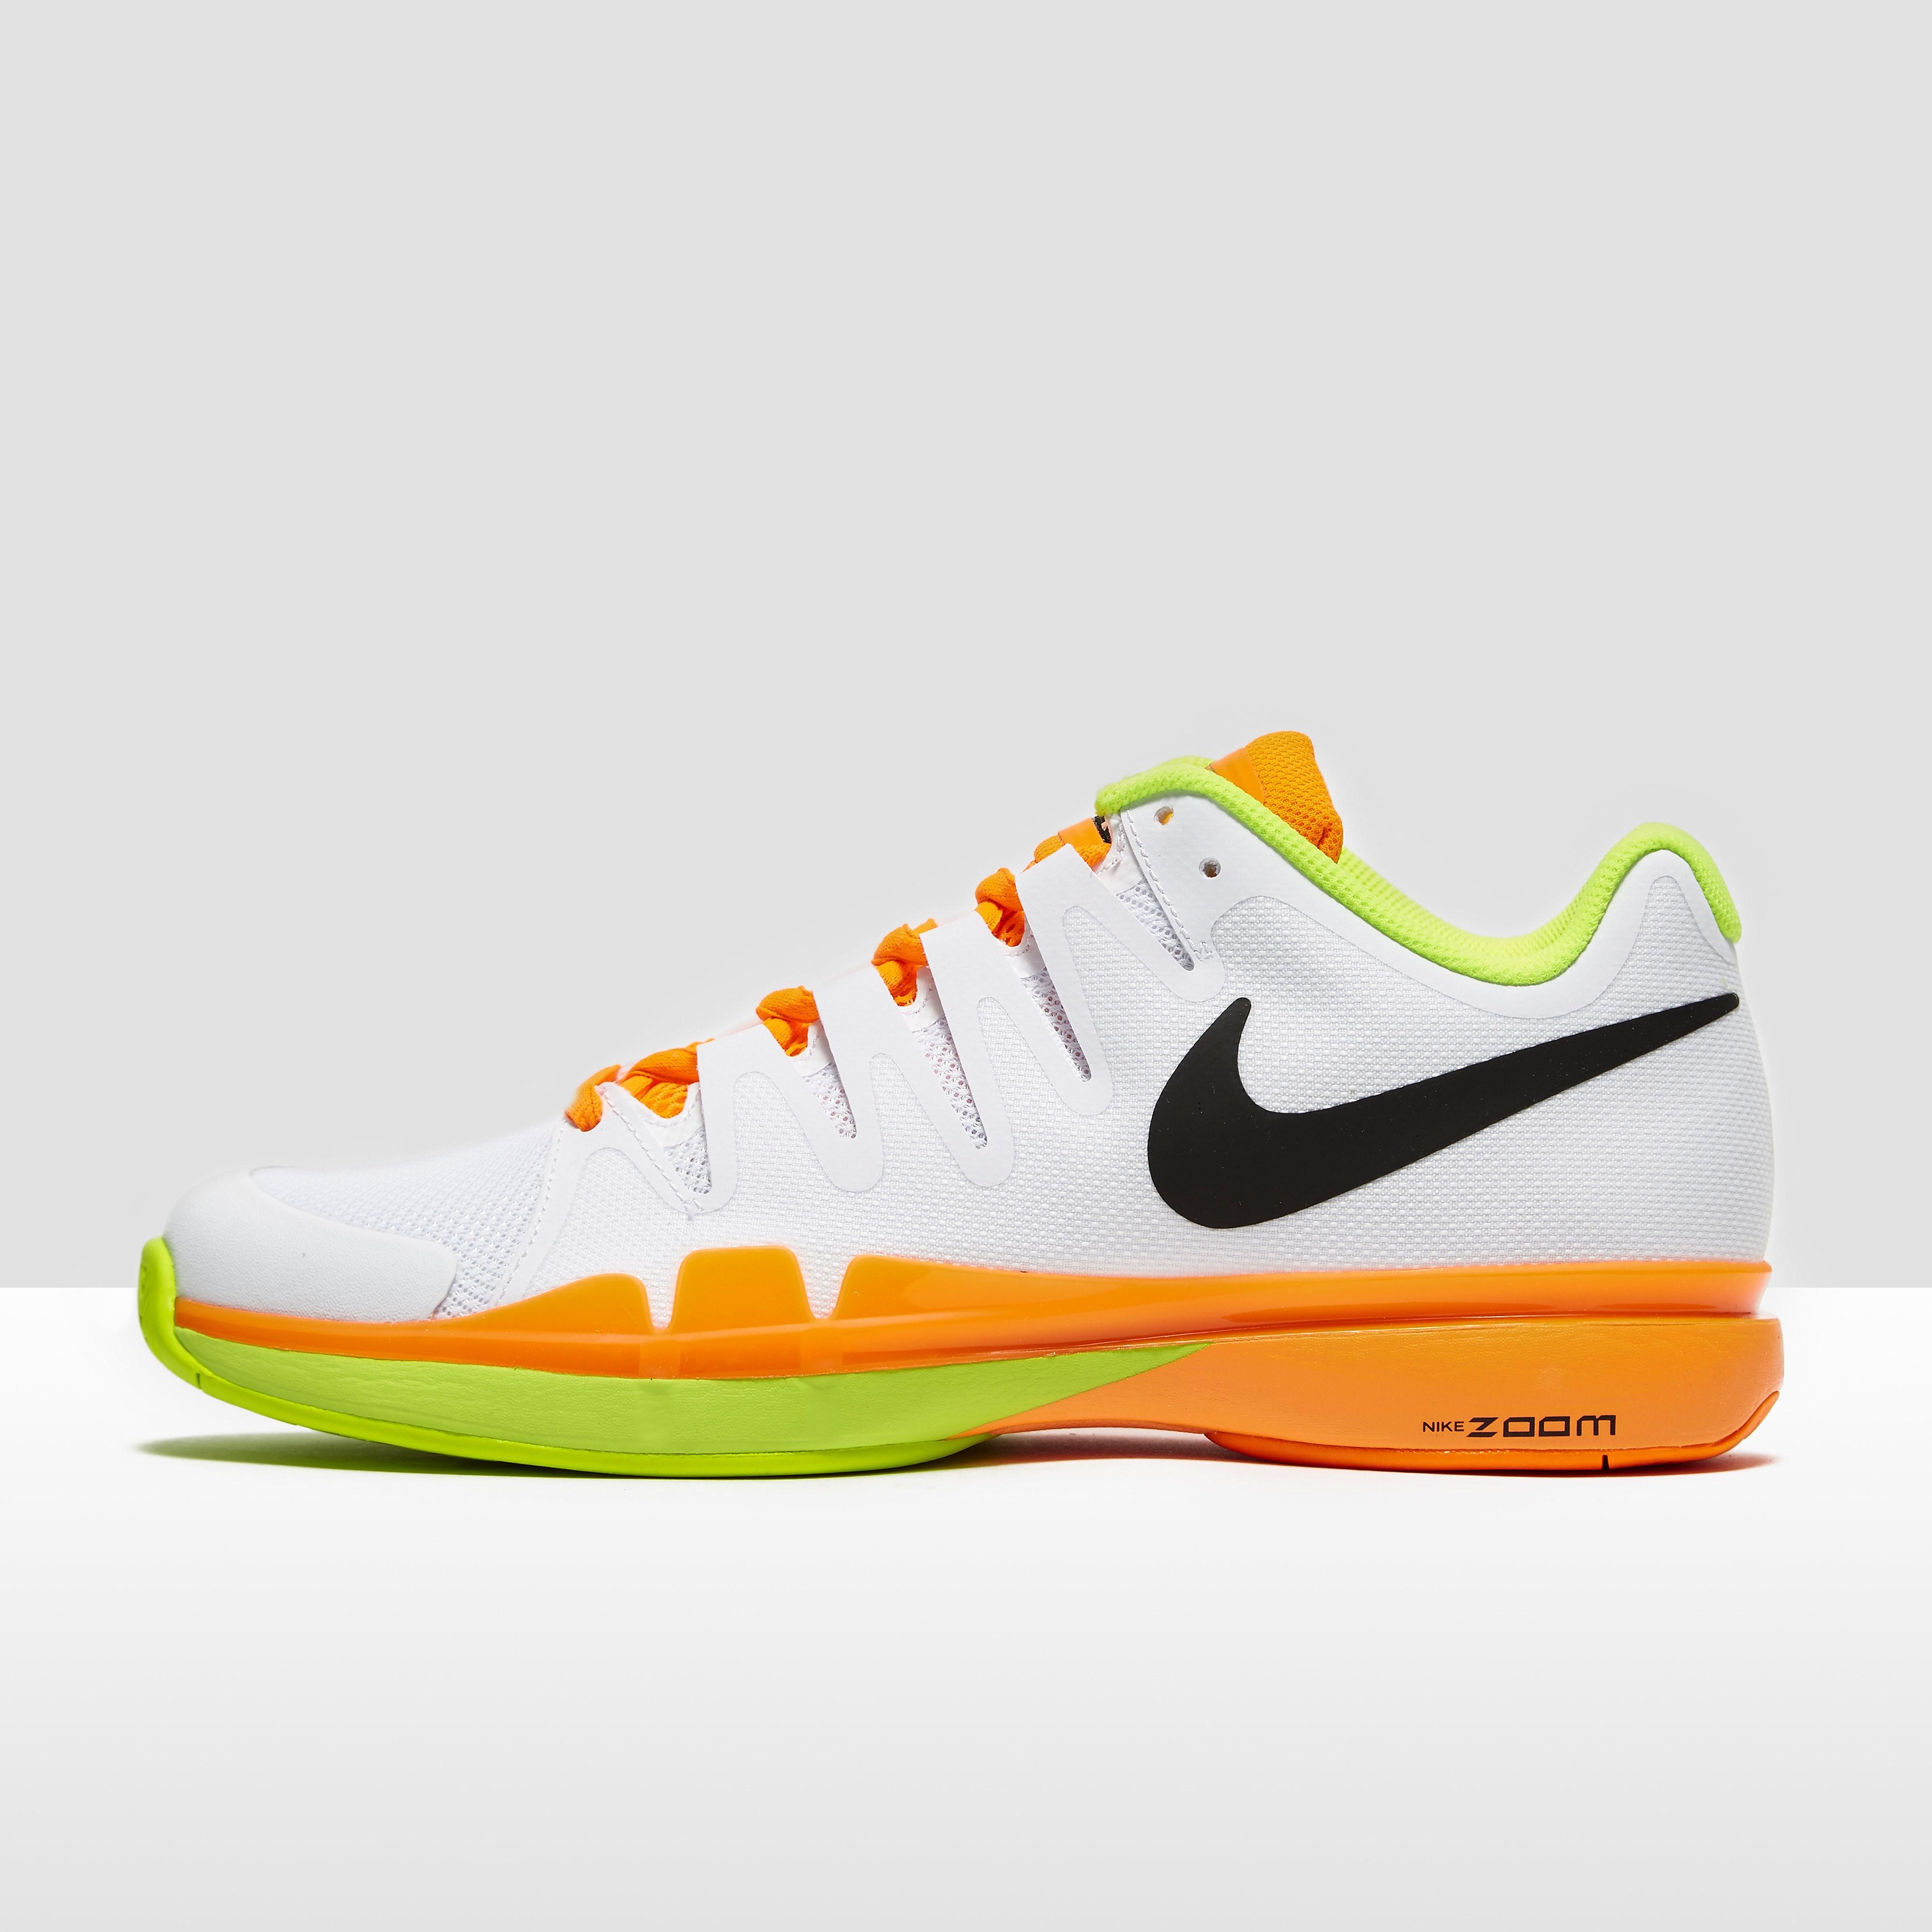 Nike NIKE ZOOM VAPOR 9.5 Men's Tennis Shoes